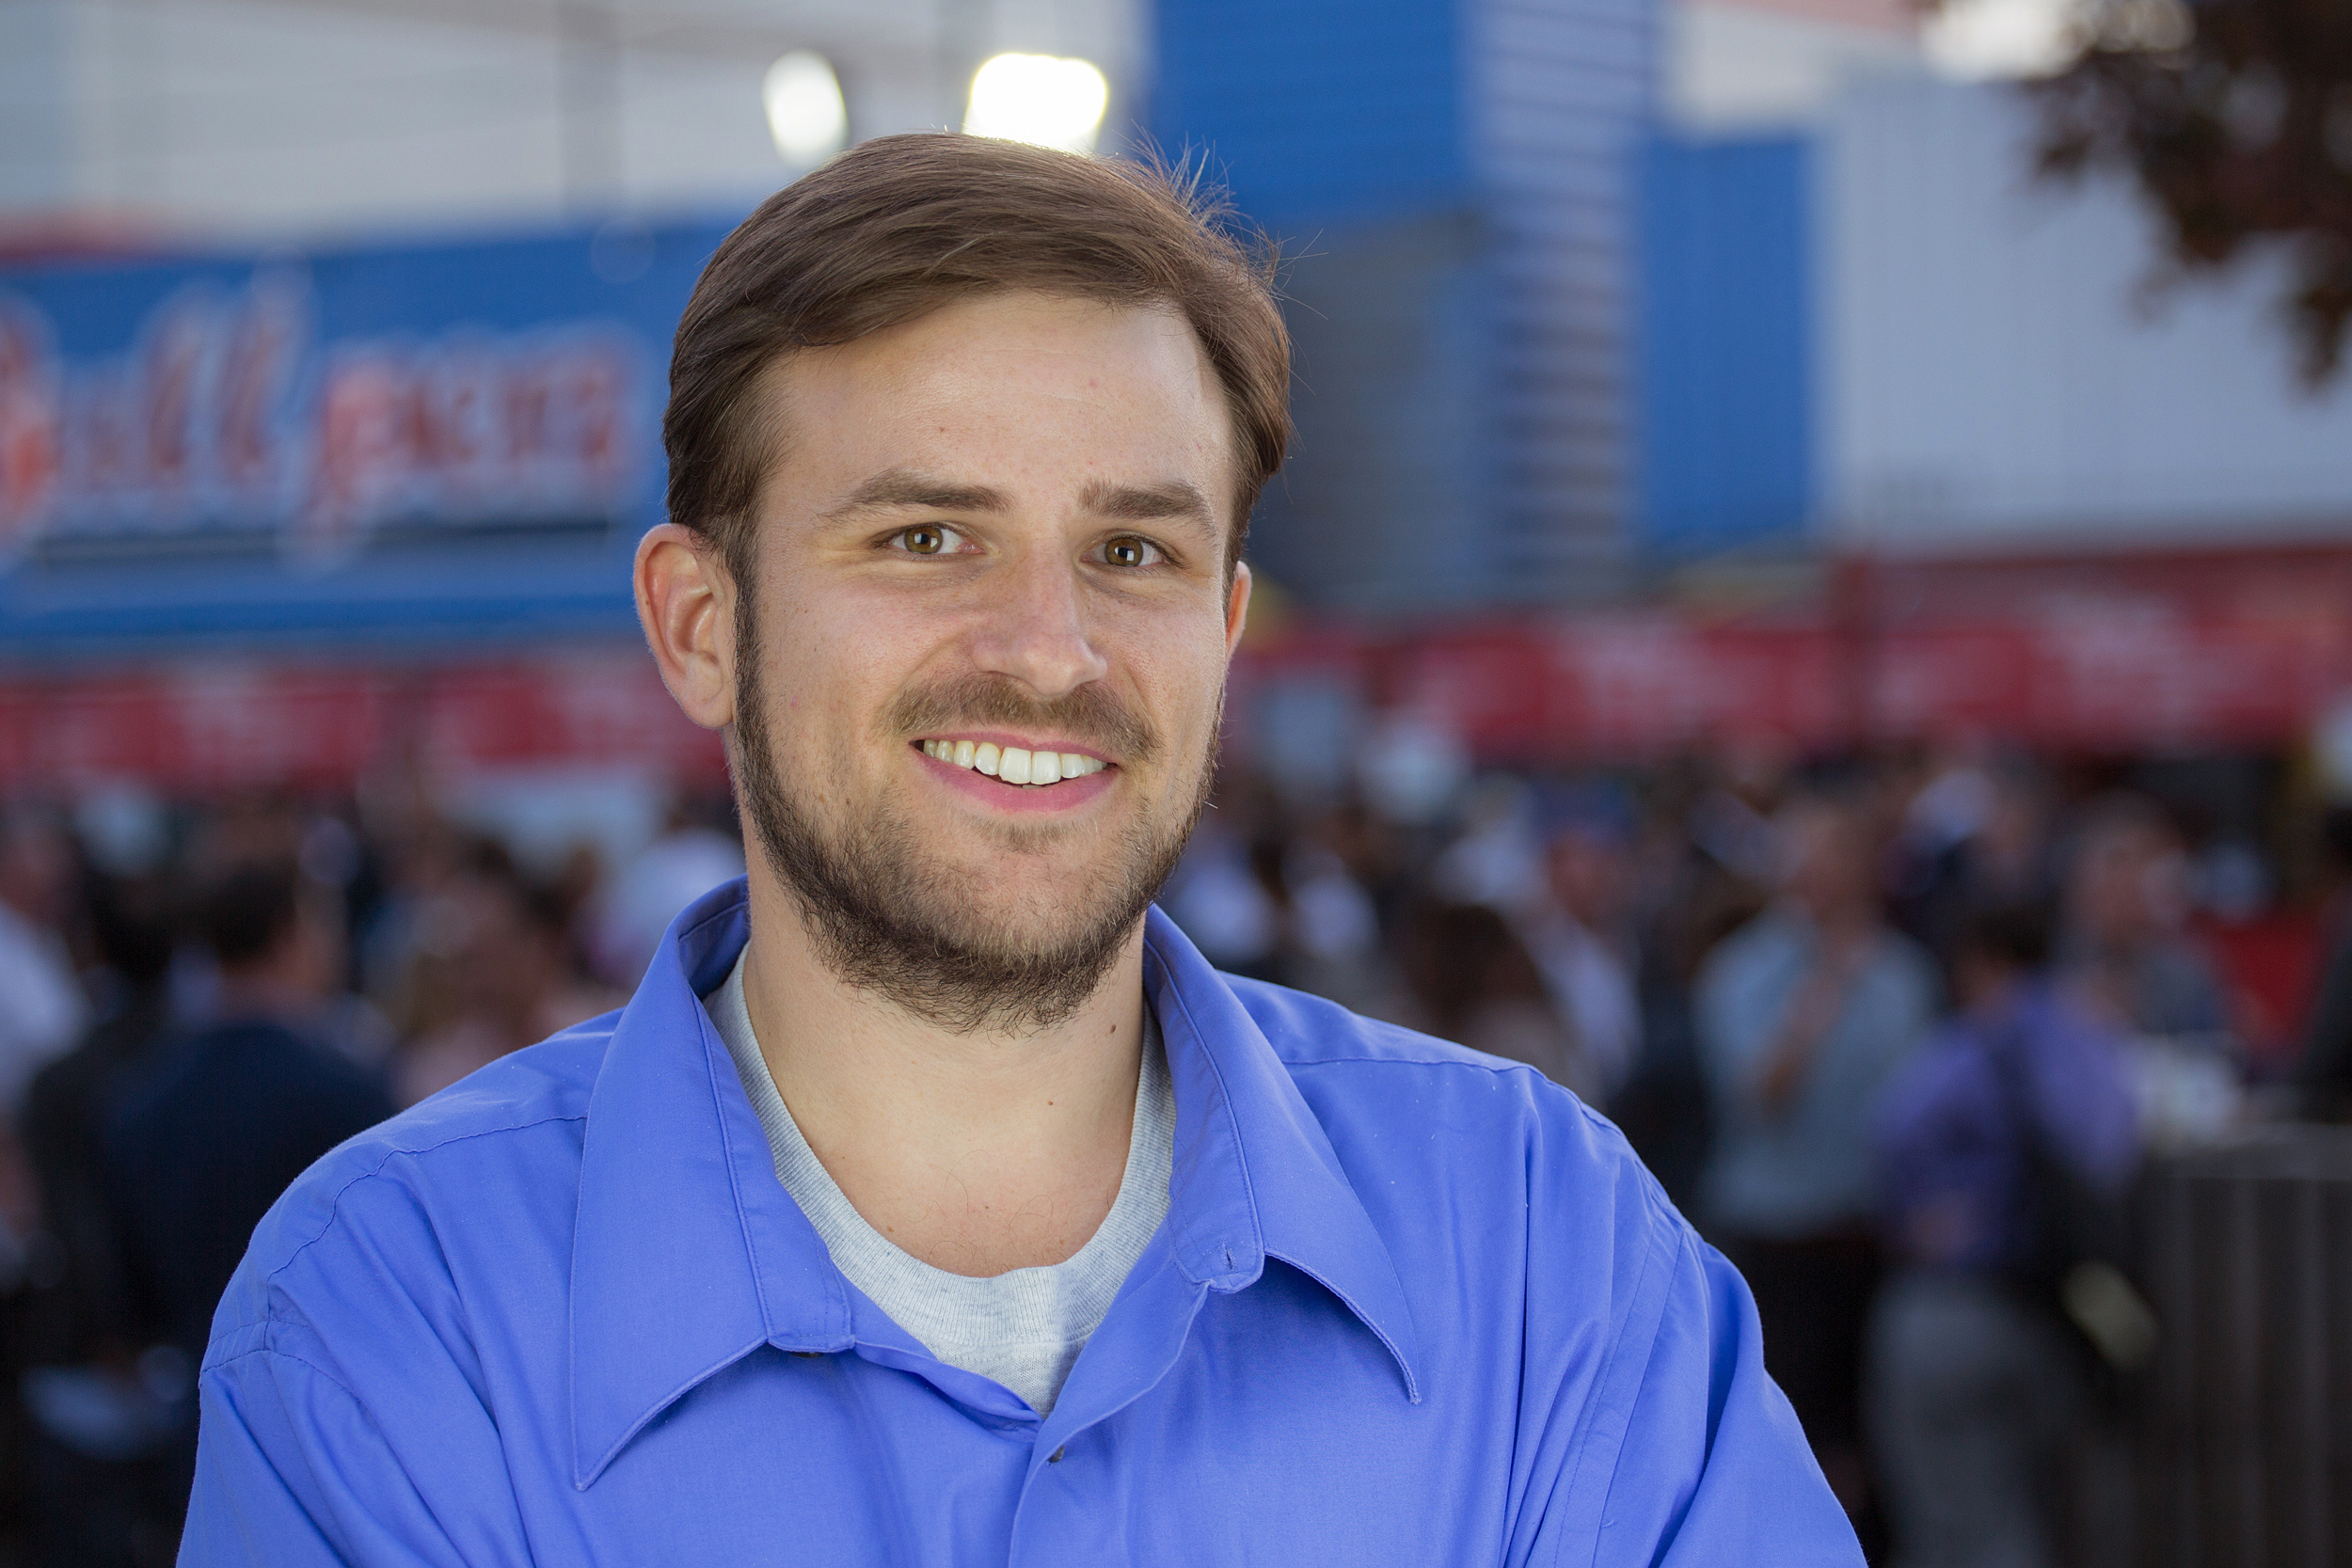 BBG's Will Sullivan Speaks at SXSW Interactive